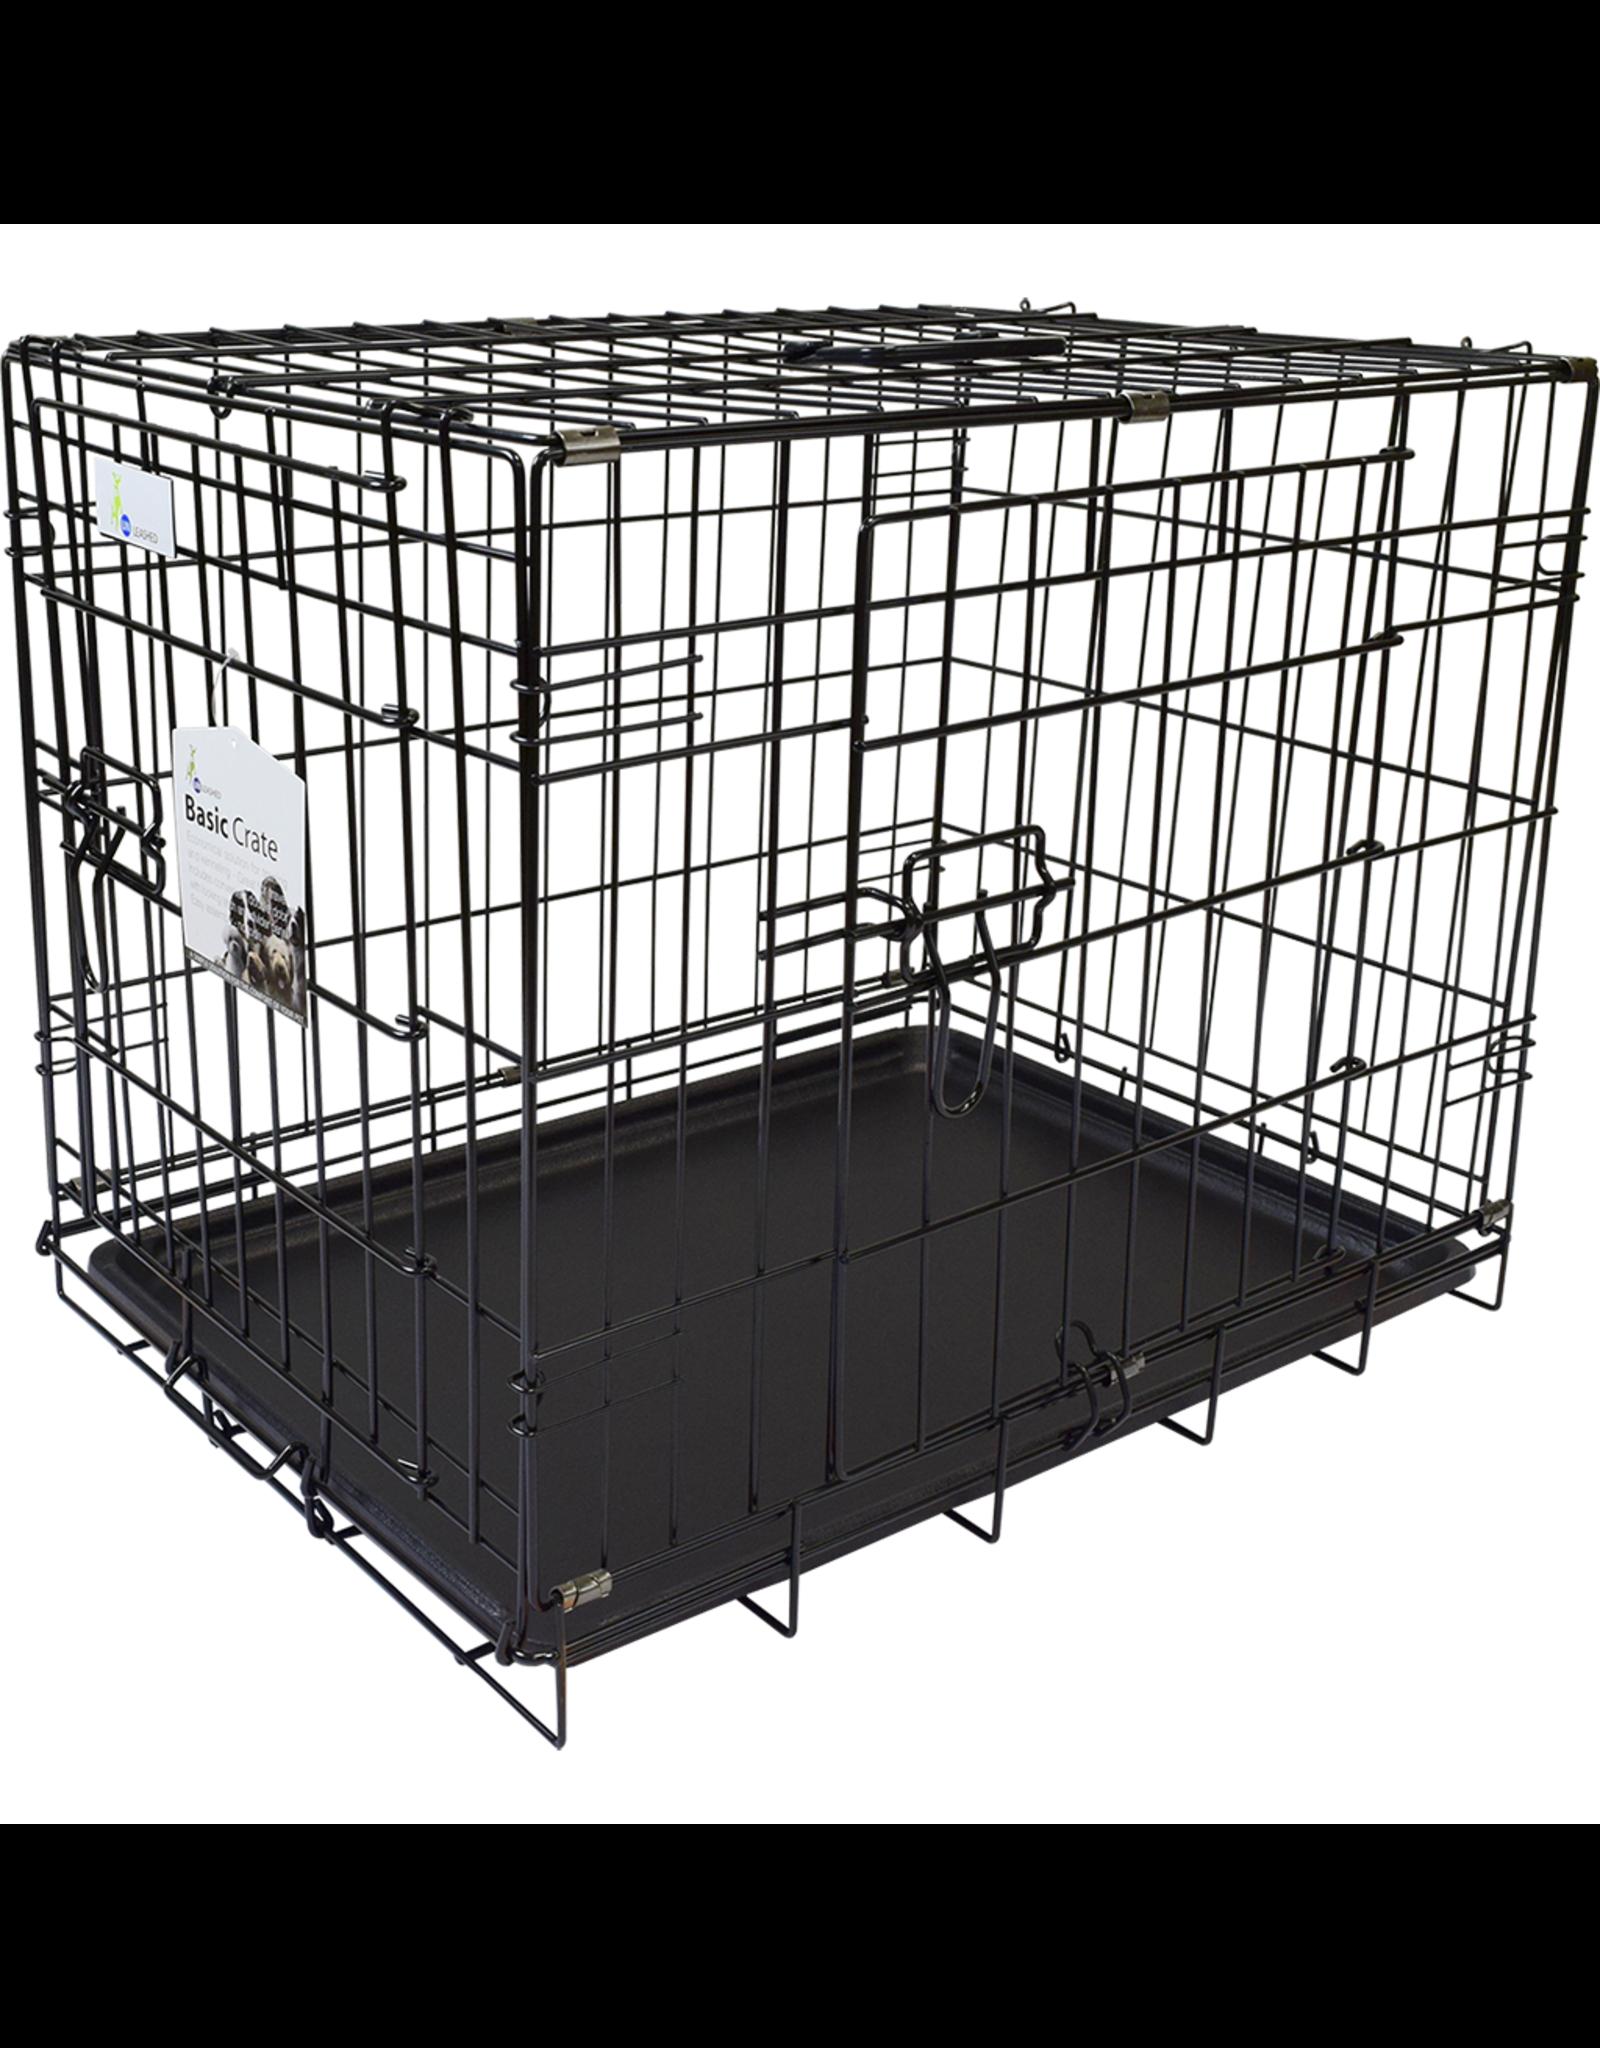 Unleashed Basic Crate